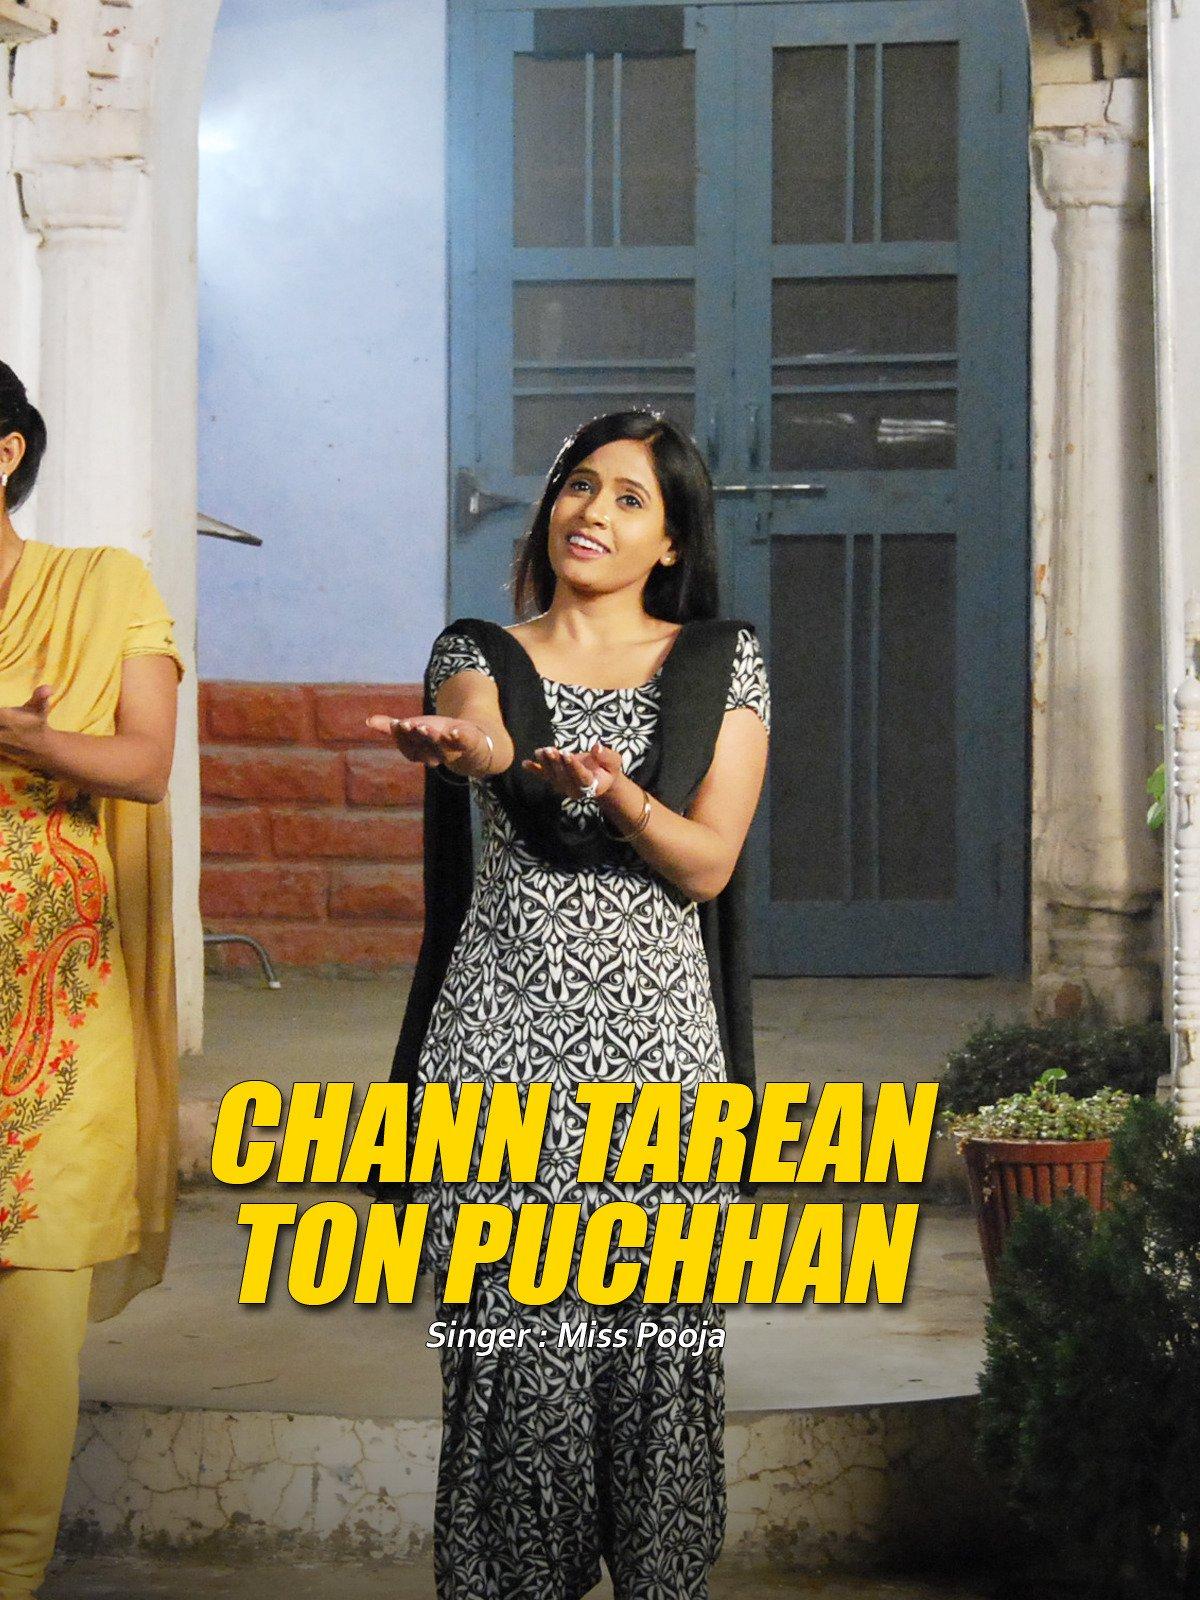 Chann Tarean Ton Puchhan on Amazon Prime Video UK